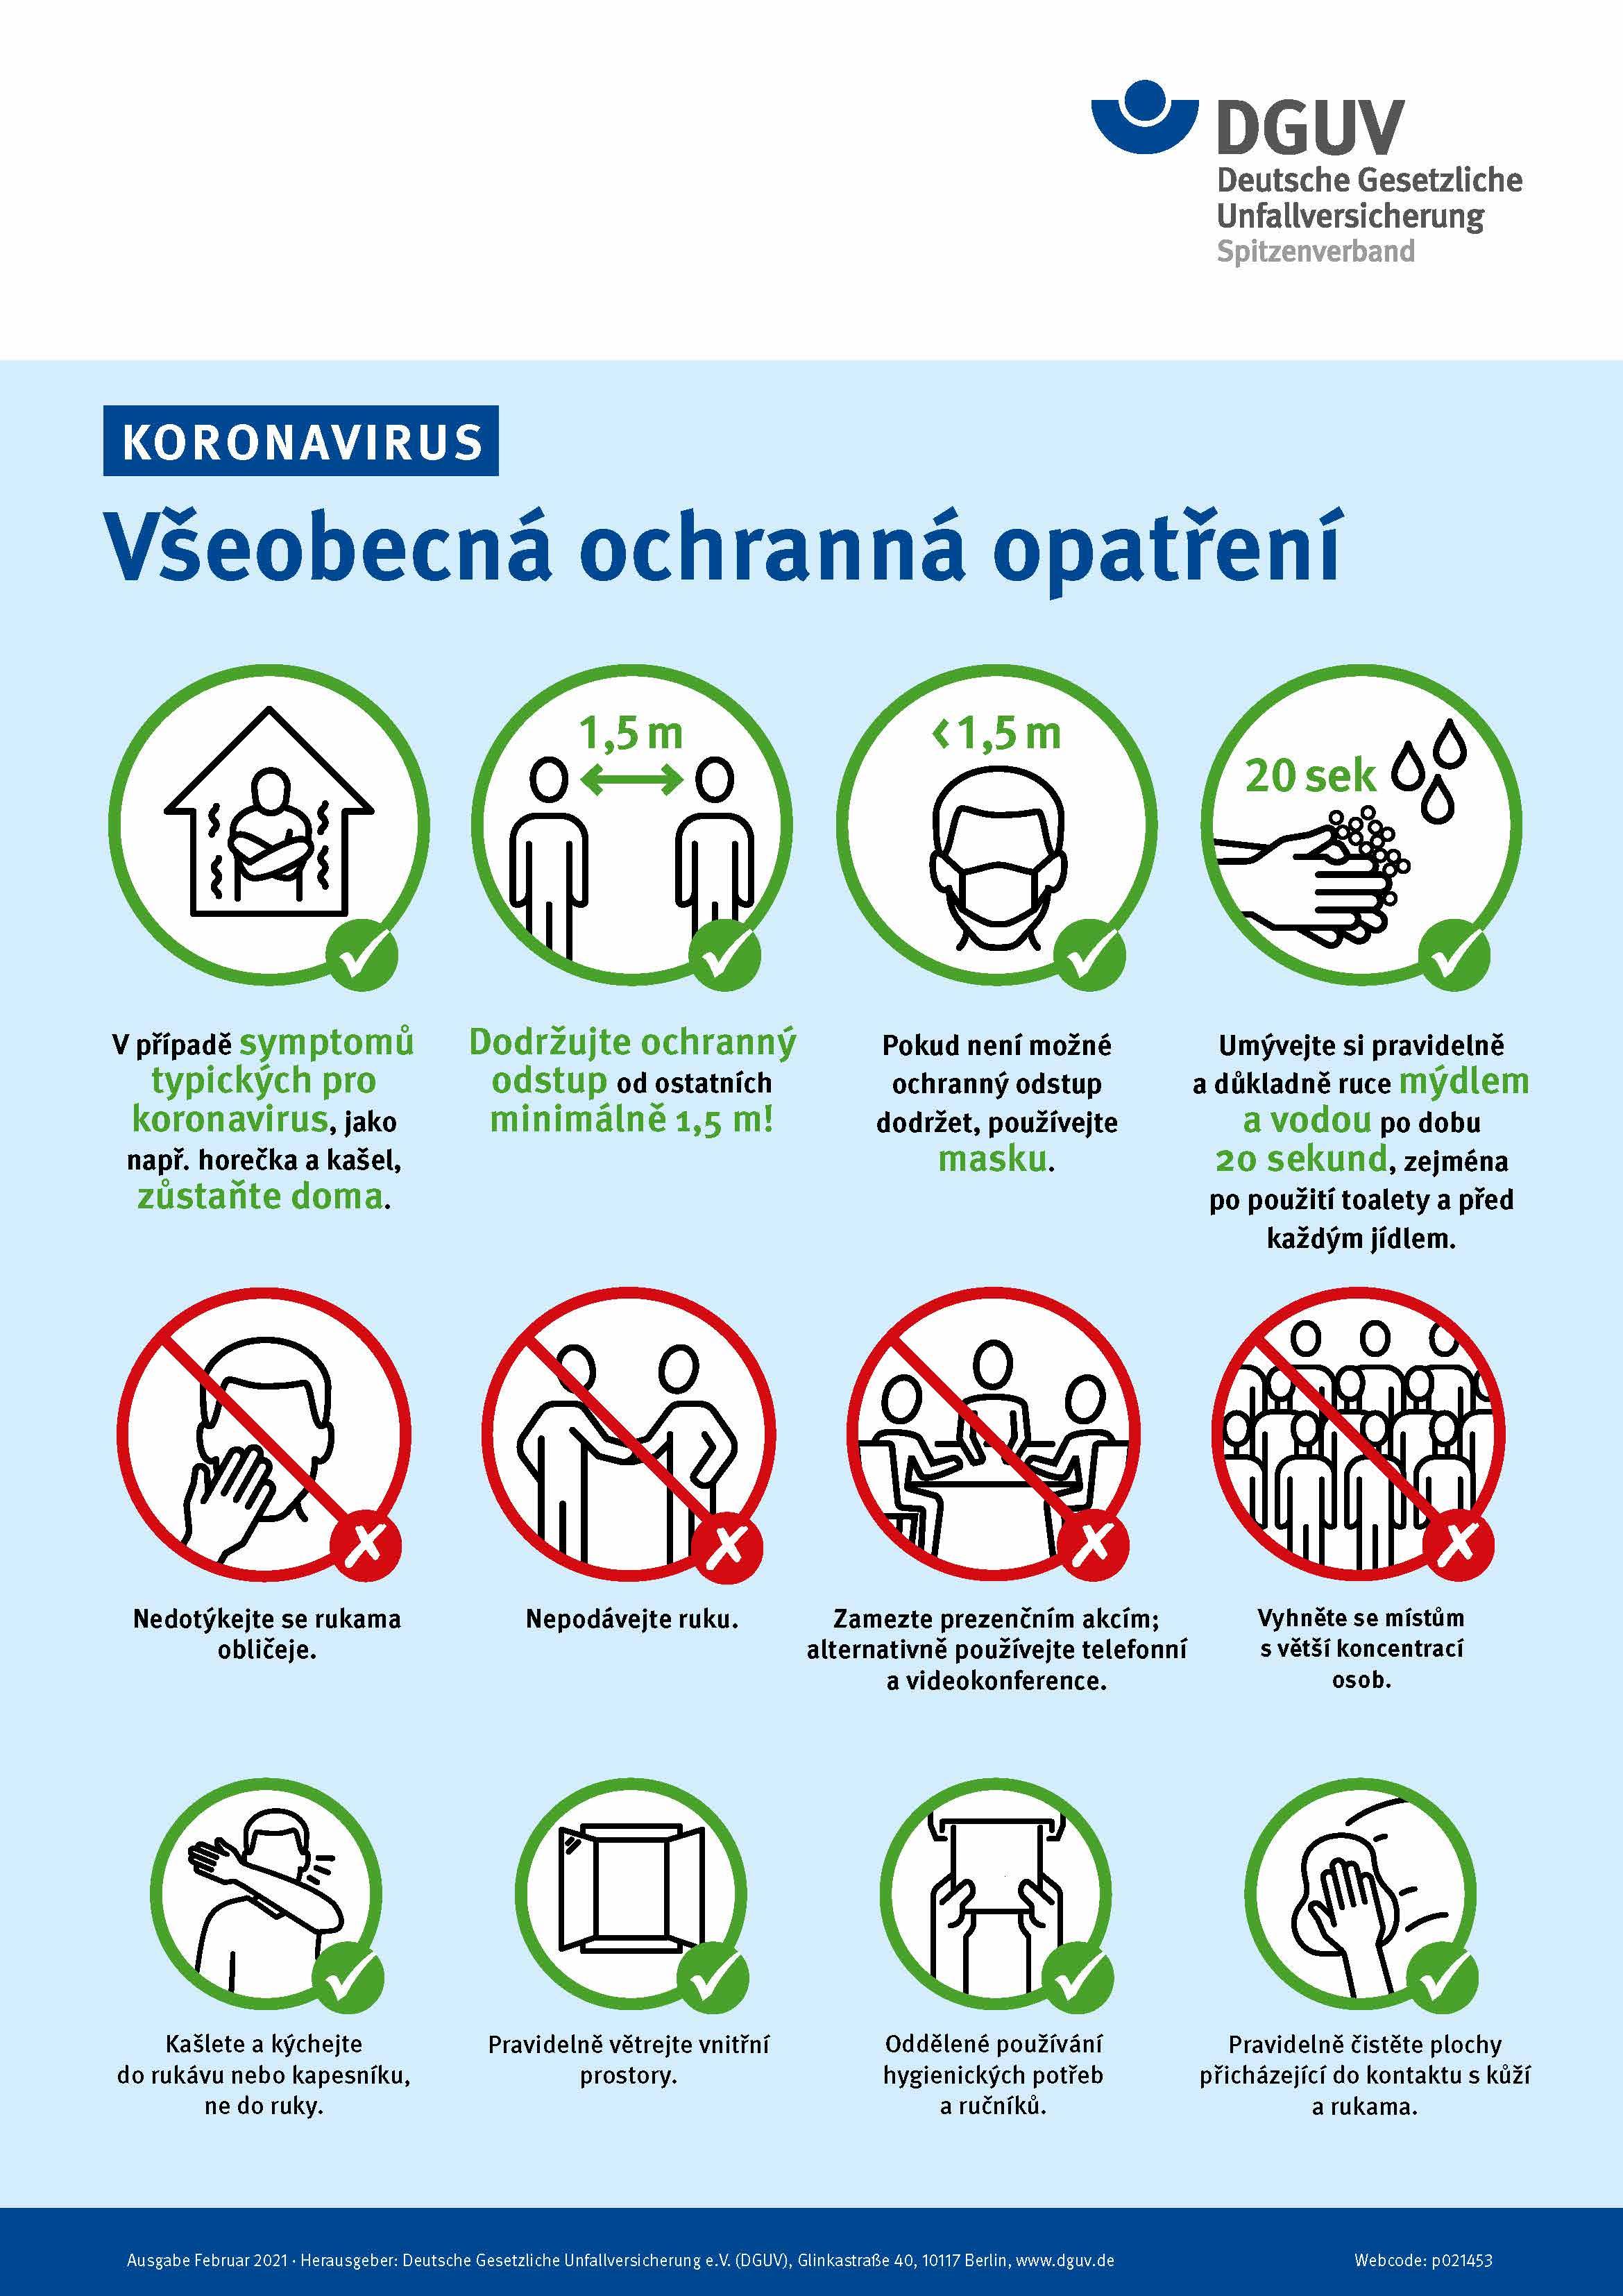 Coronavirus Zahlen Weltweit Aktuell